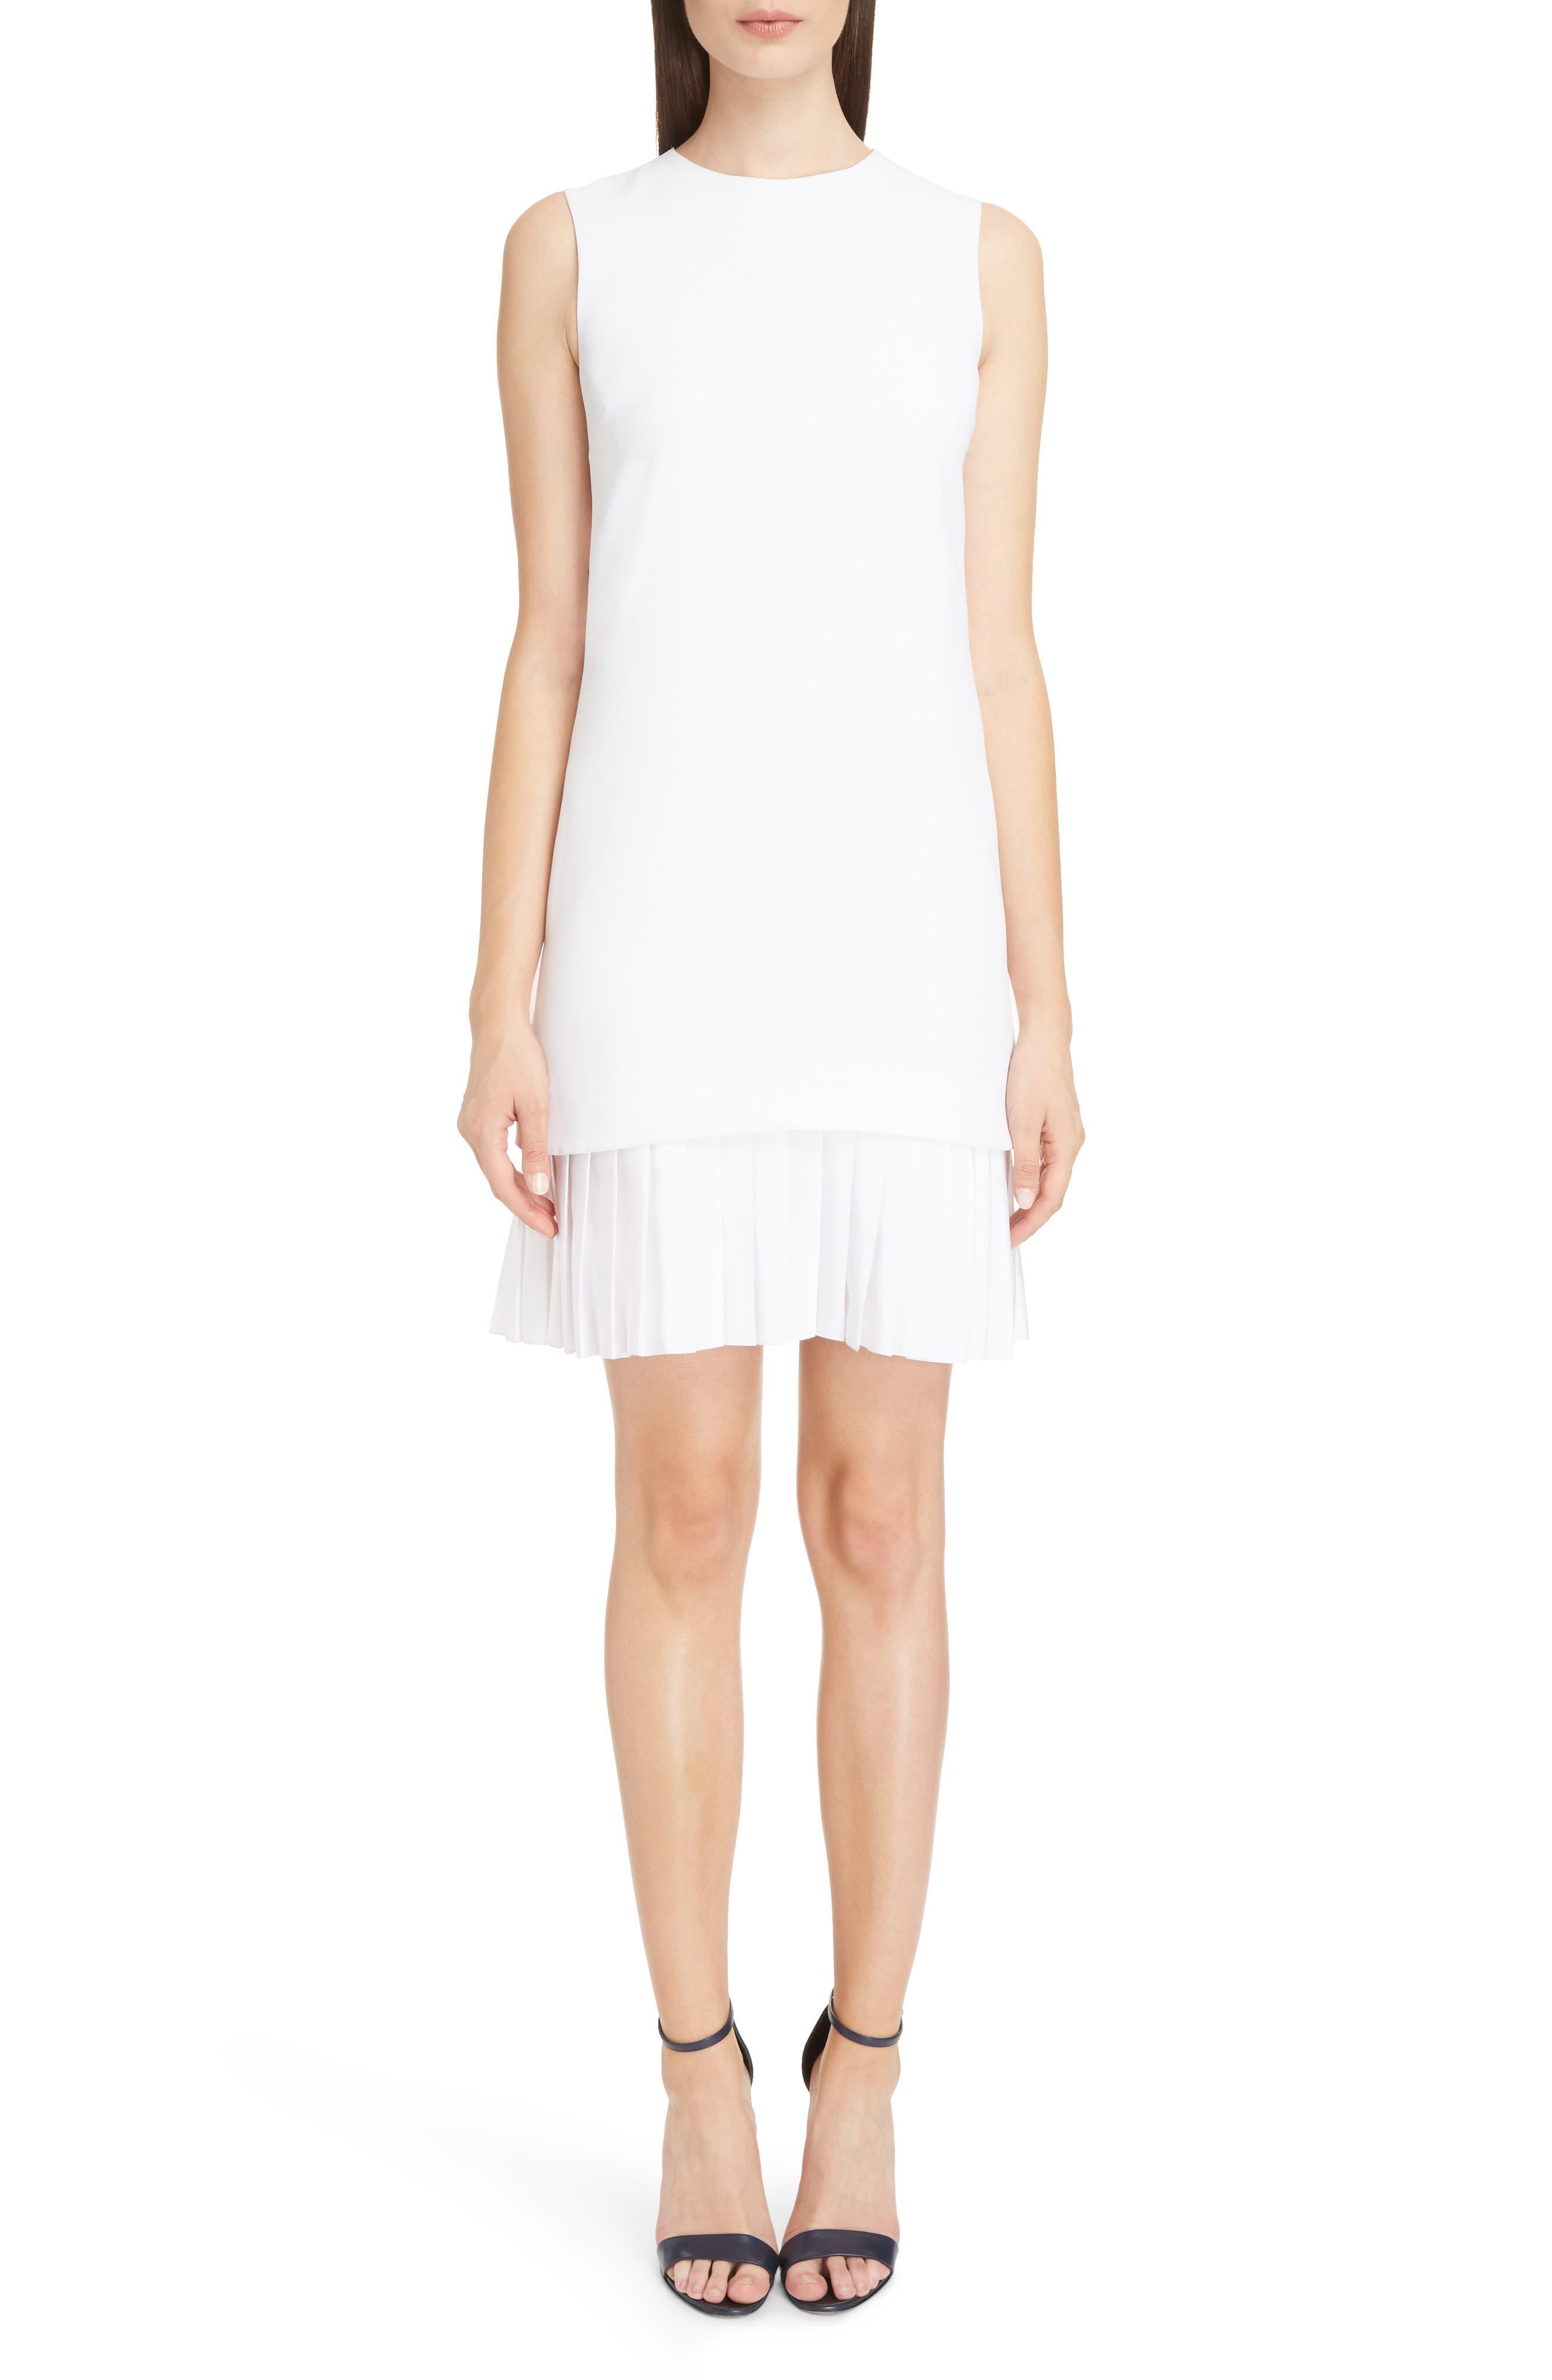 Victoria Victoria Beckham Pleated Hem Shift Dress,                             Main thumbnail 1, color,                             Optic White